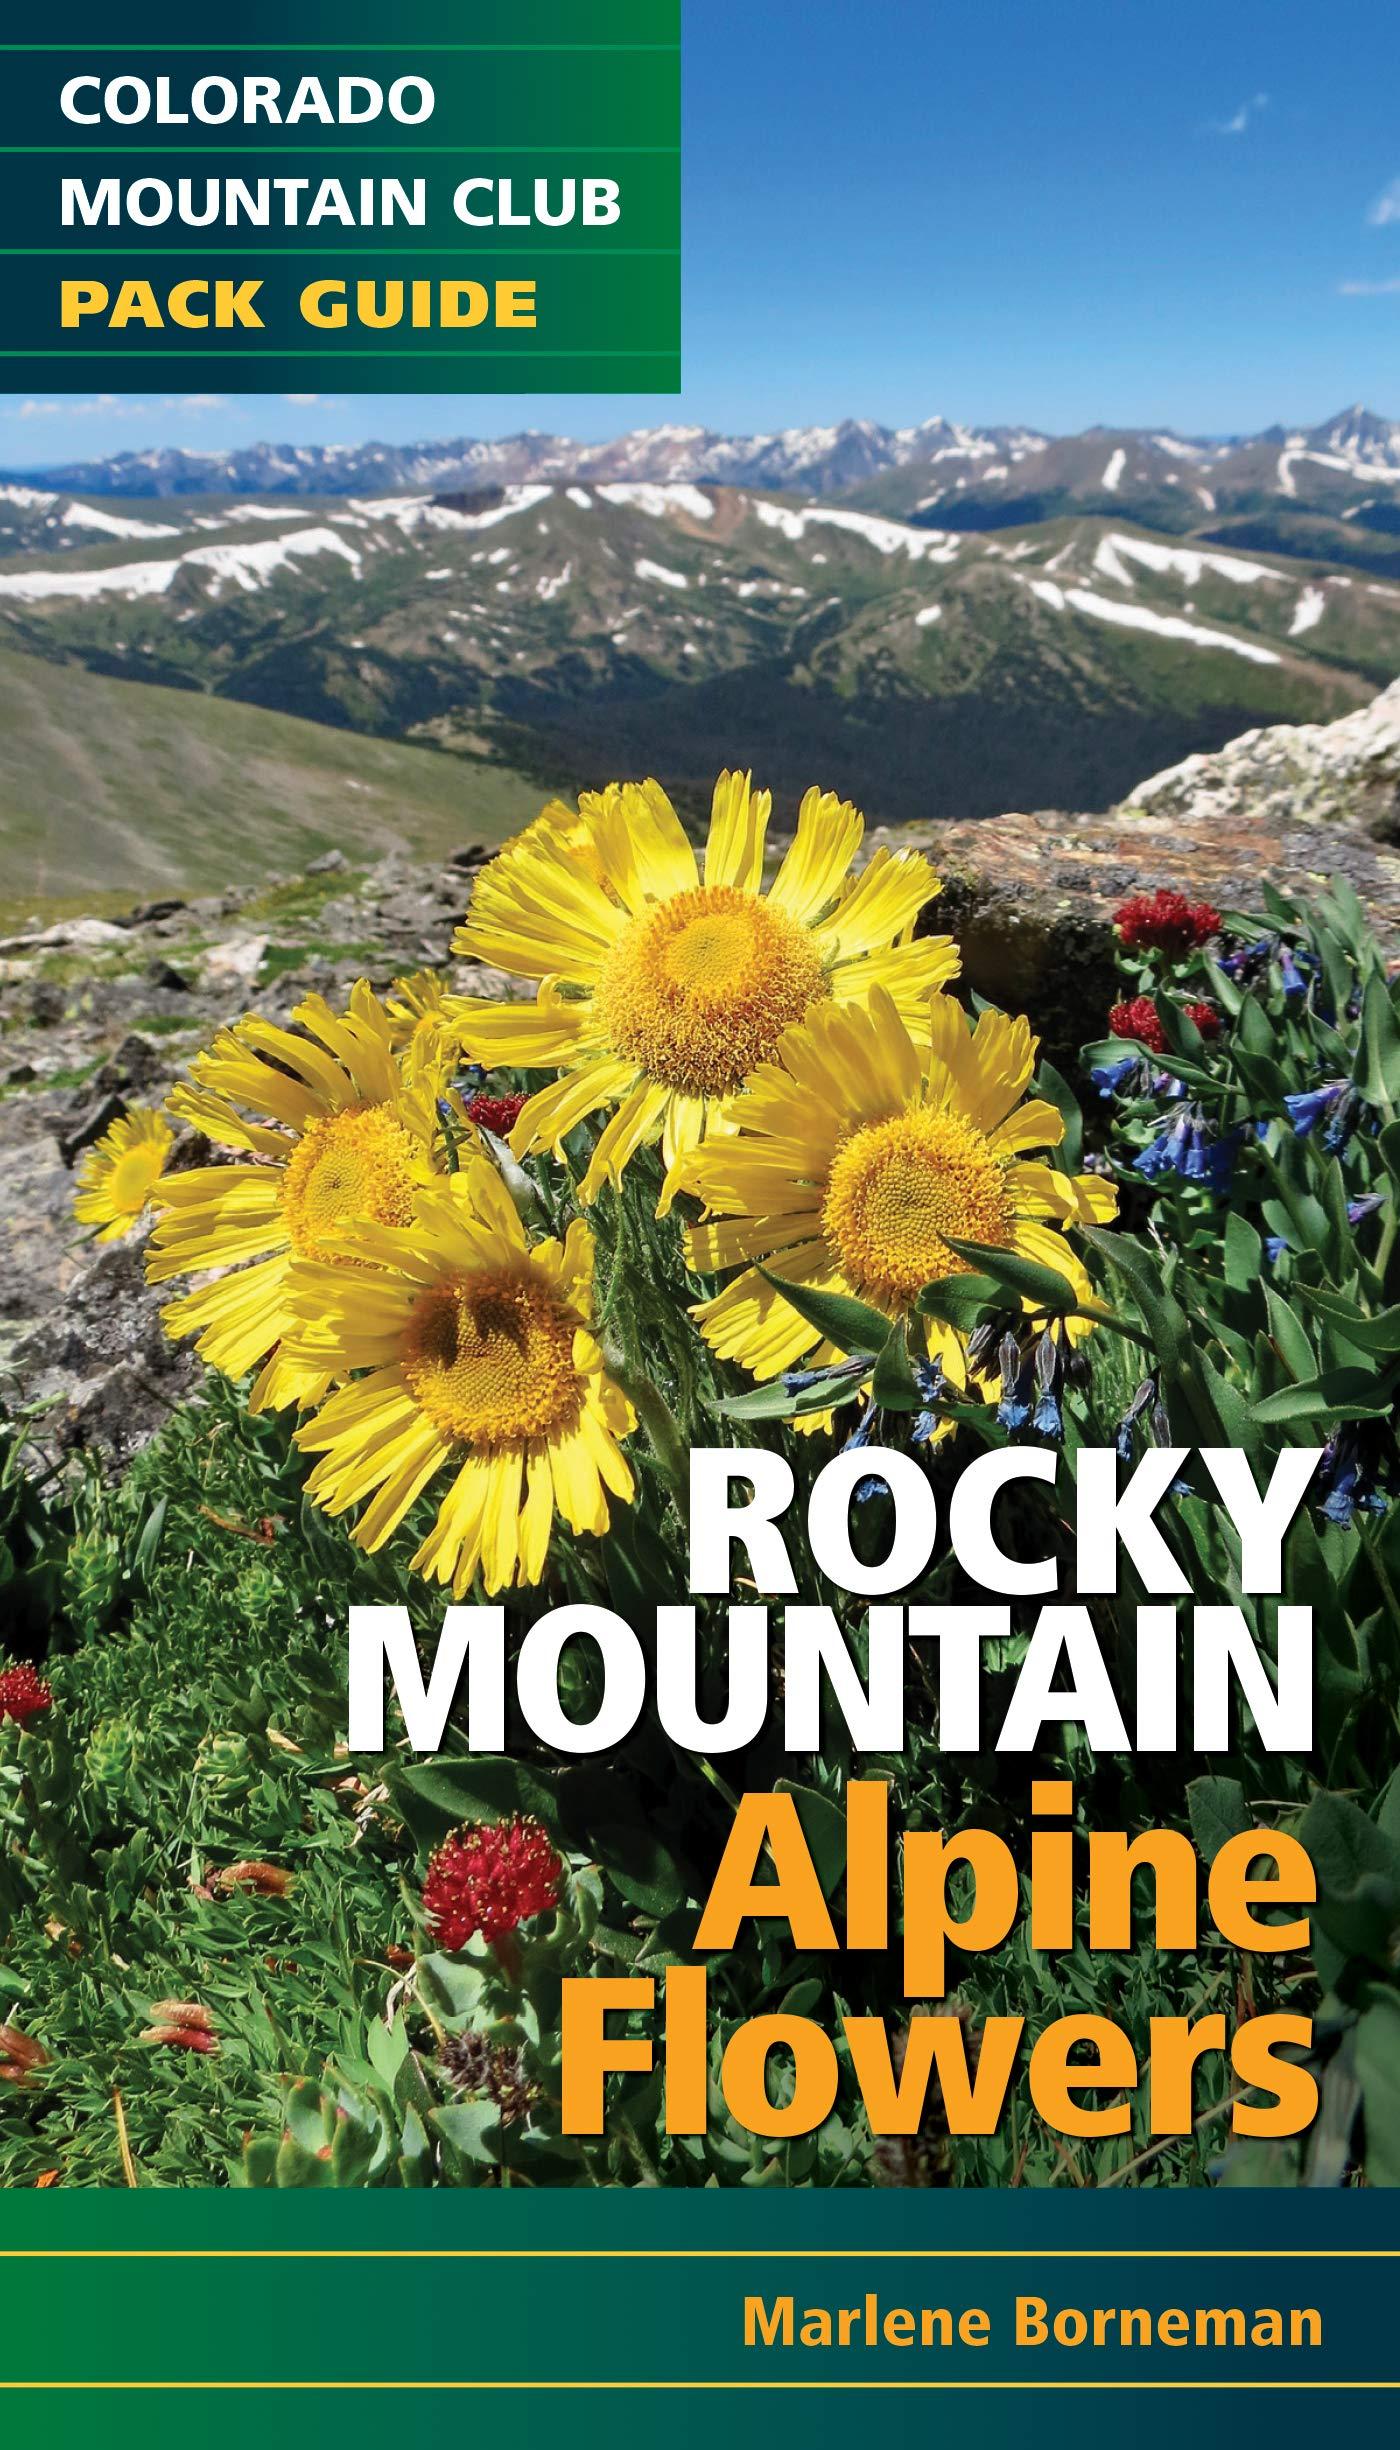 Rocky Mountain Alpine Flowers Colorado Mountain Club Pack Guide: Amazon.es: Borneman, Marlene: Libros en idiomas extranjeros